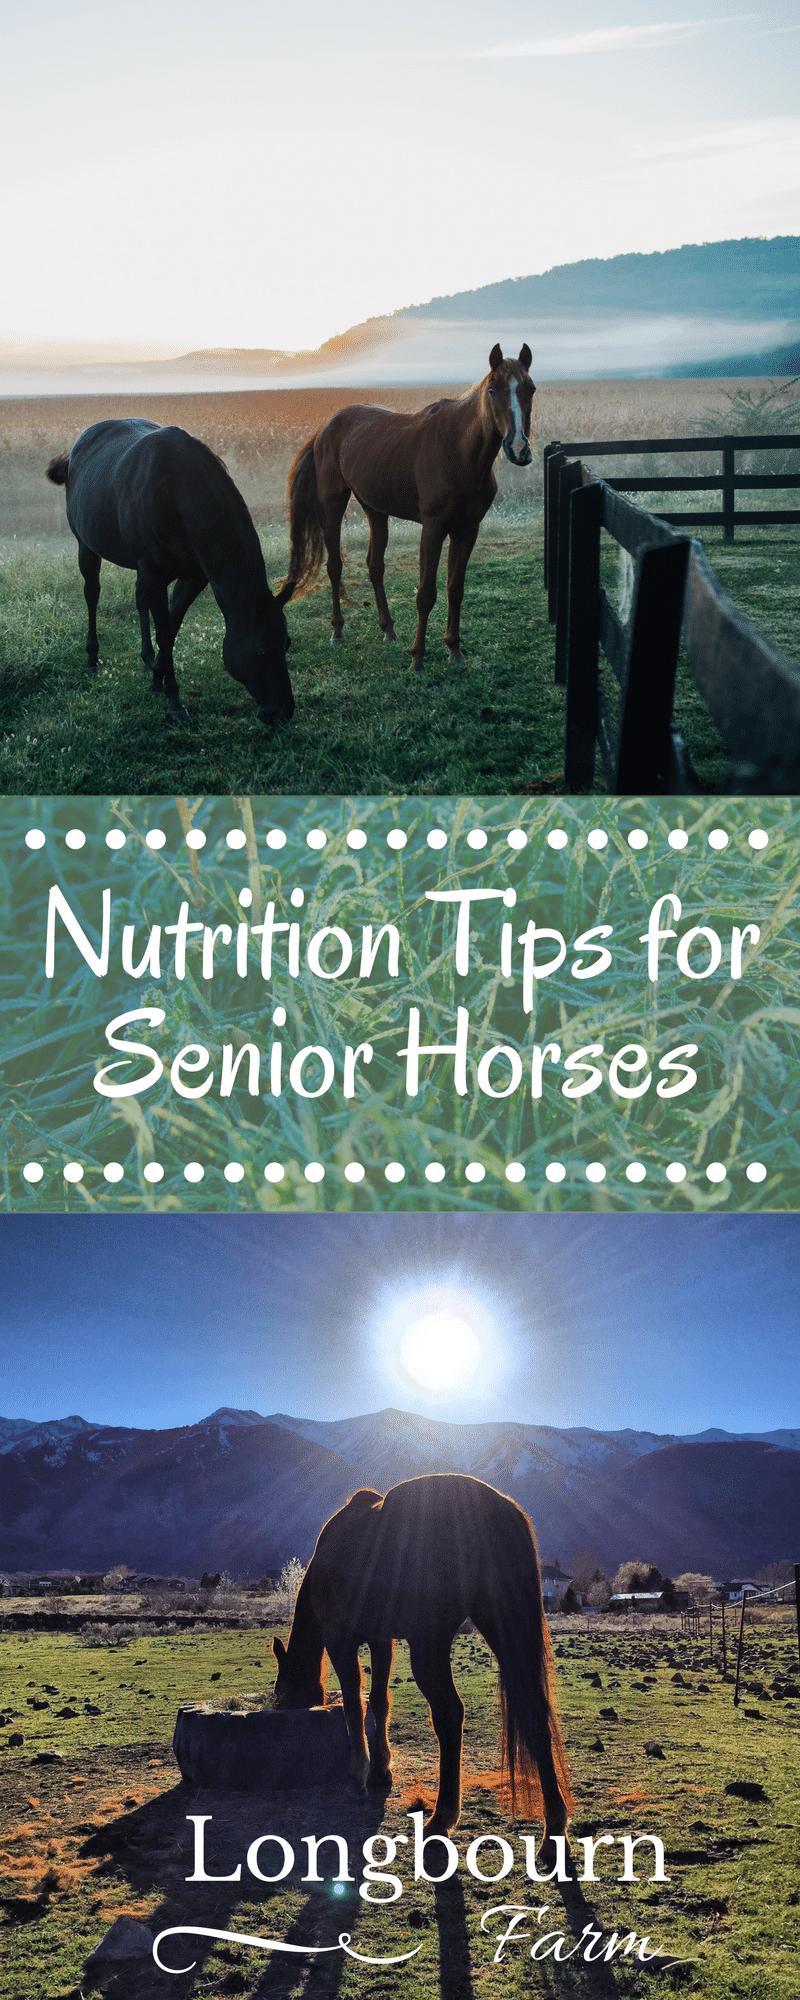 Nutrition Tips for Senior Horses Horses, Horse care